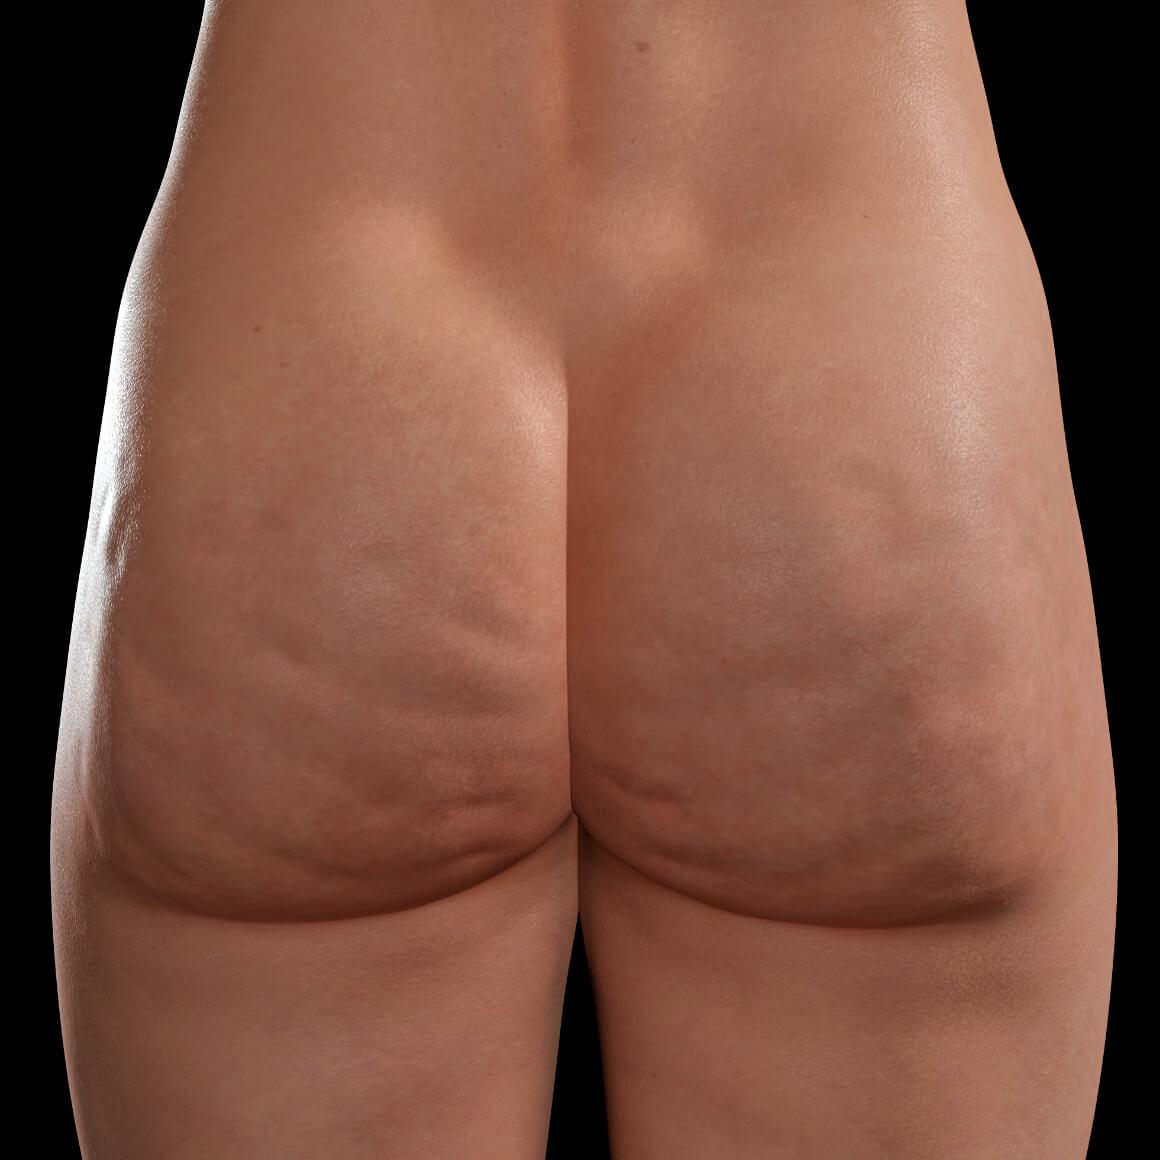 Buttocks of a Clinique Chloé female patient showing cellulite